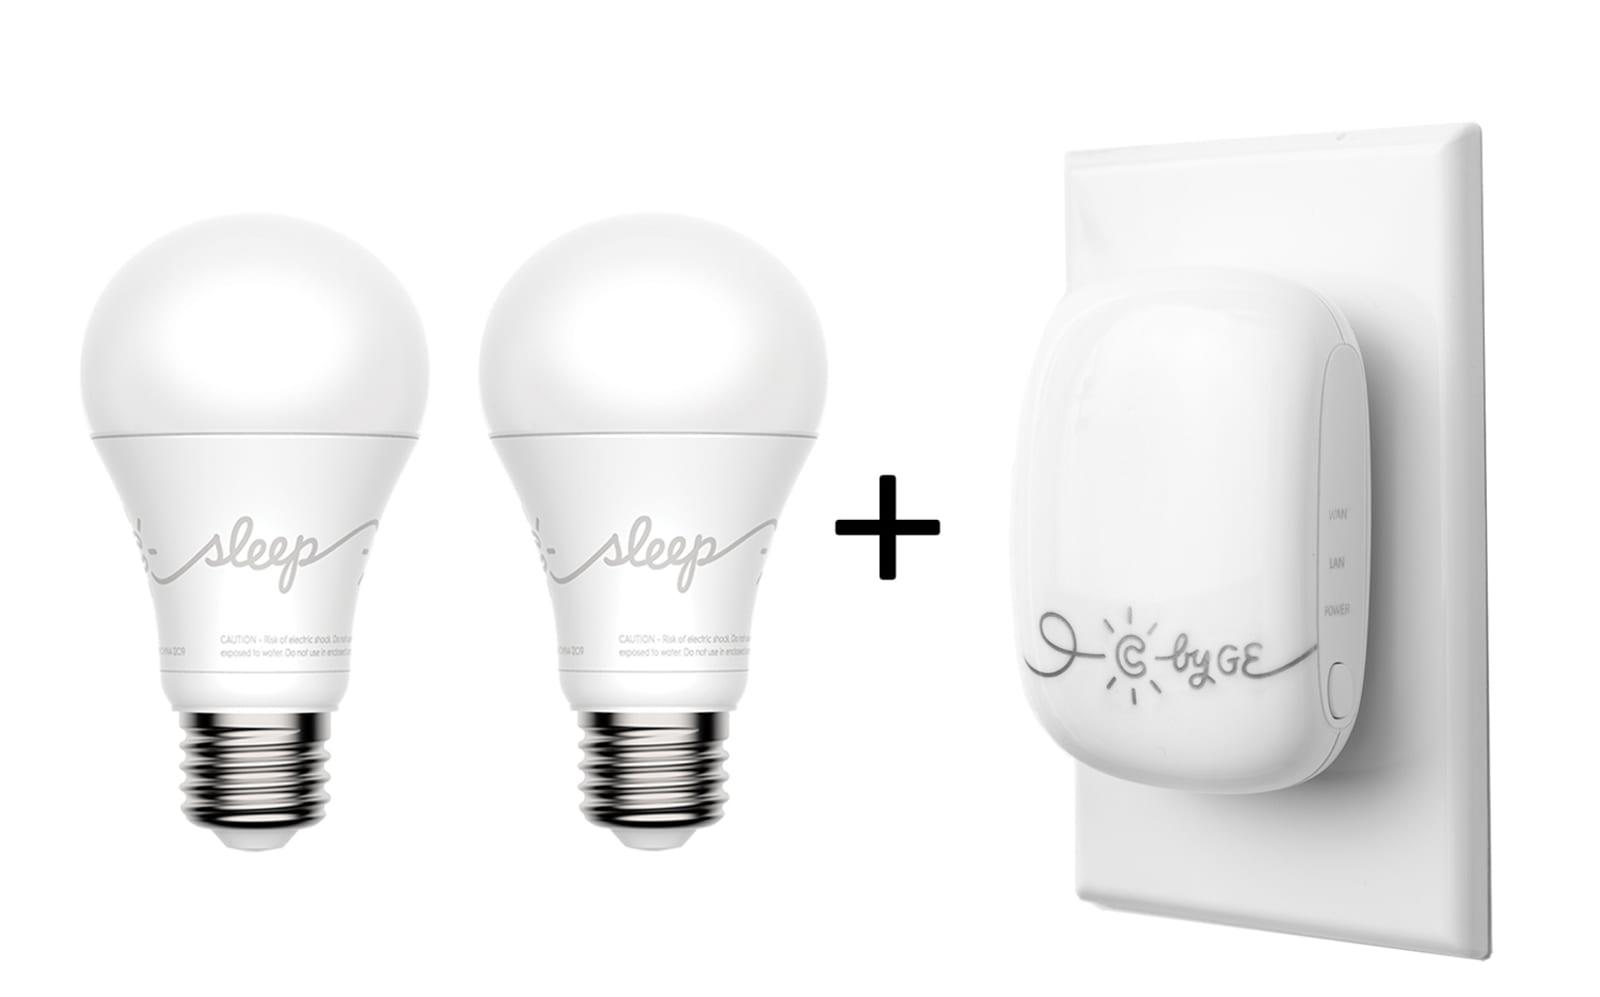 Ge S Latest Smart Lighting Includes Alexa And Homekit Options